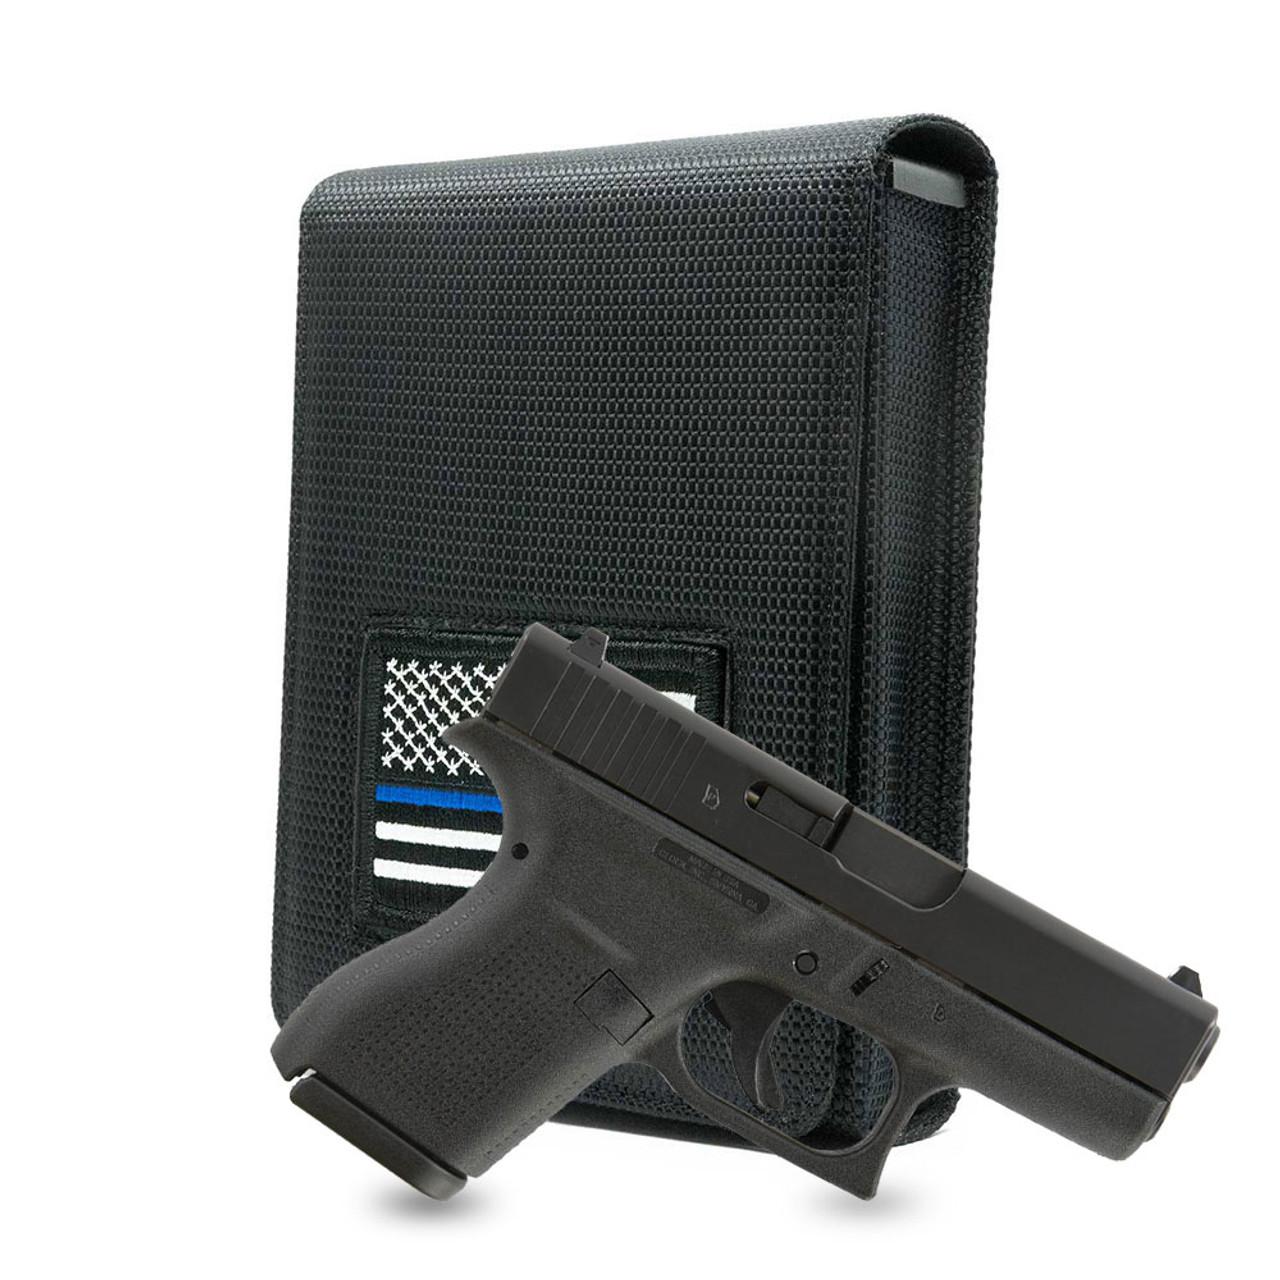 Glock 42 Thin Blue Line Holster